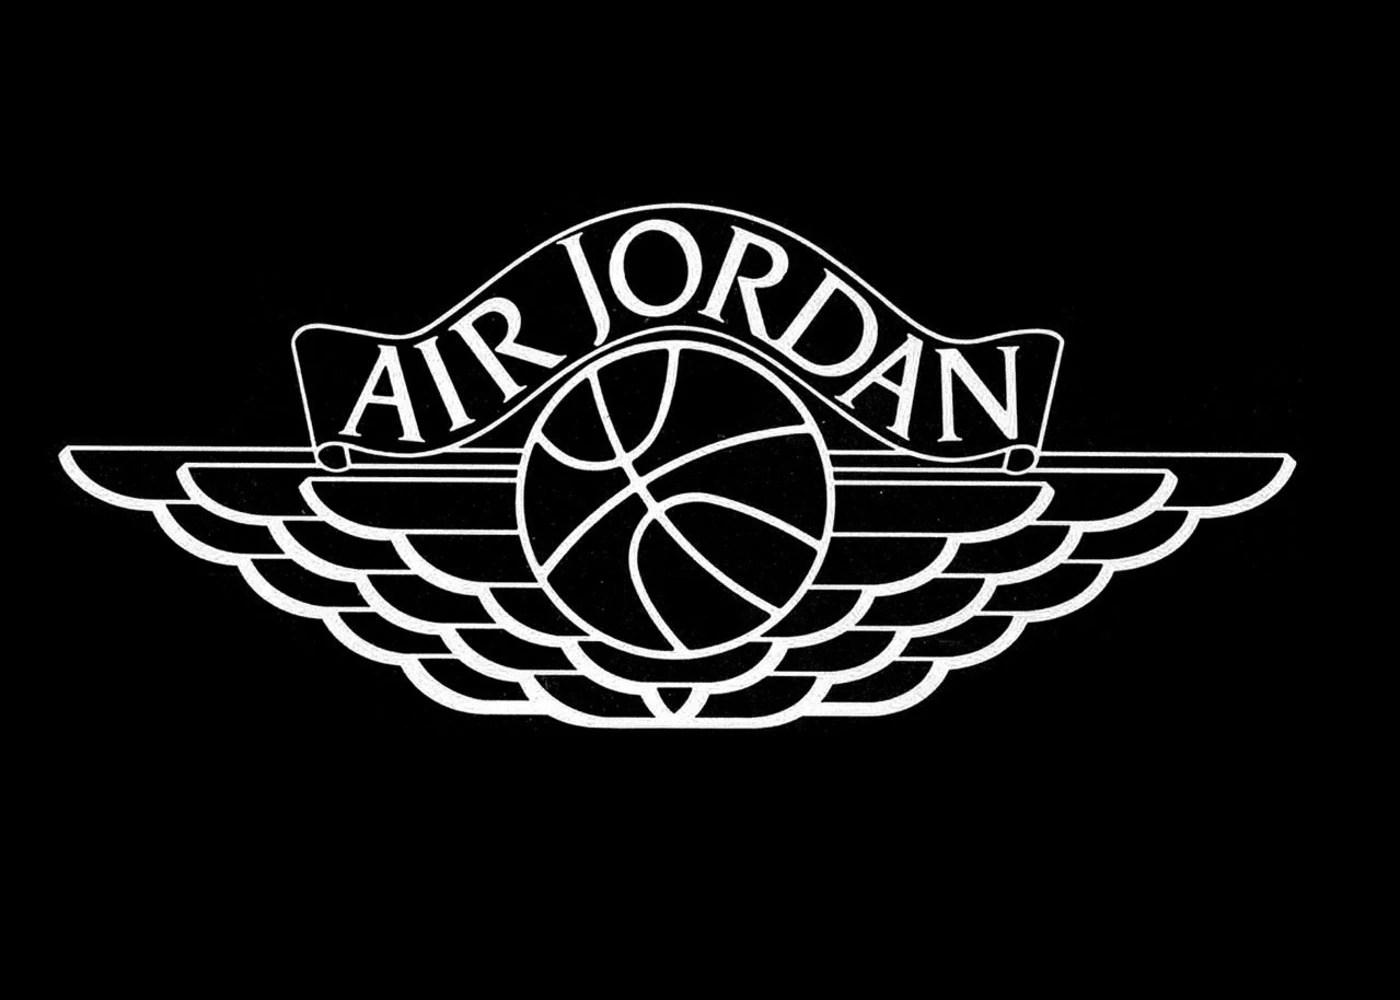 dobro krila ozivjeti jordan jumpman 23 logo